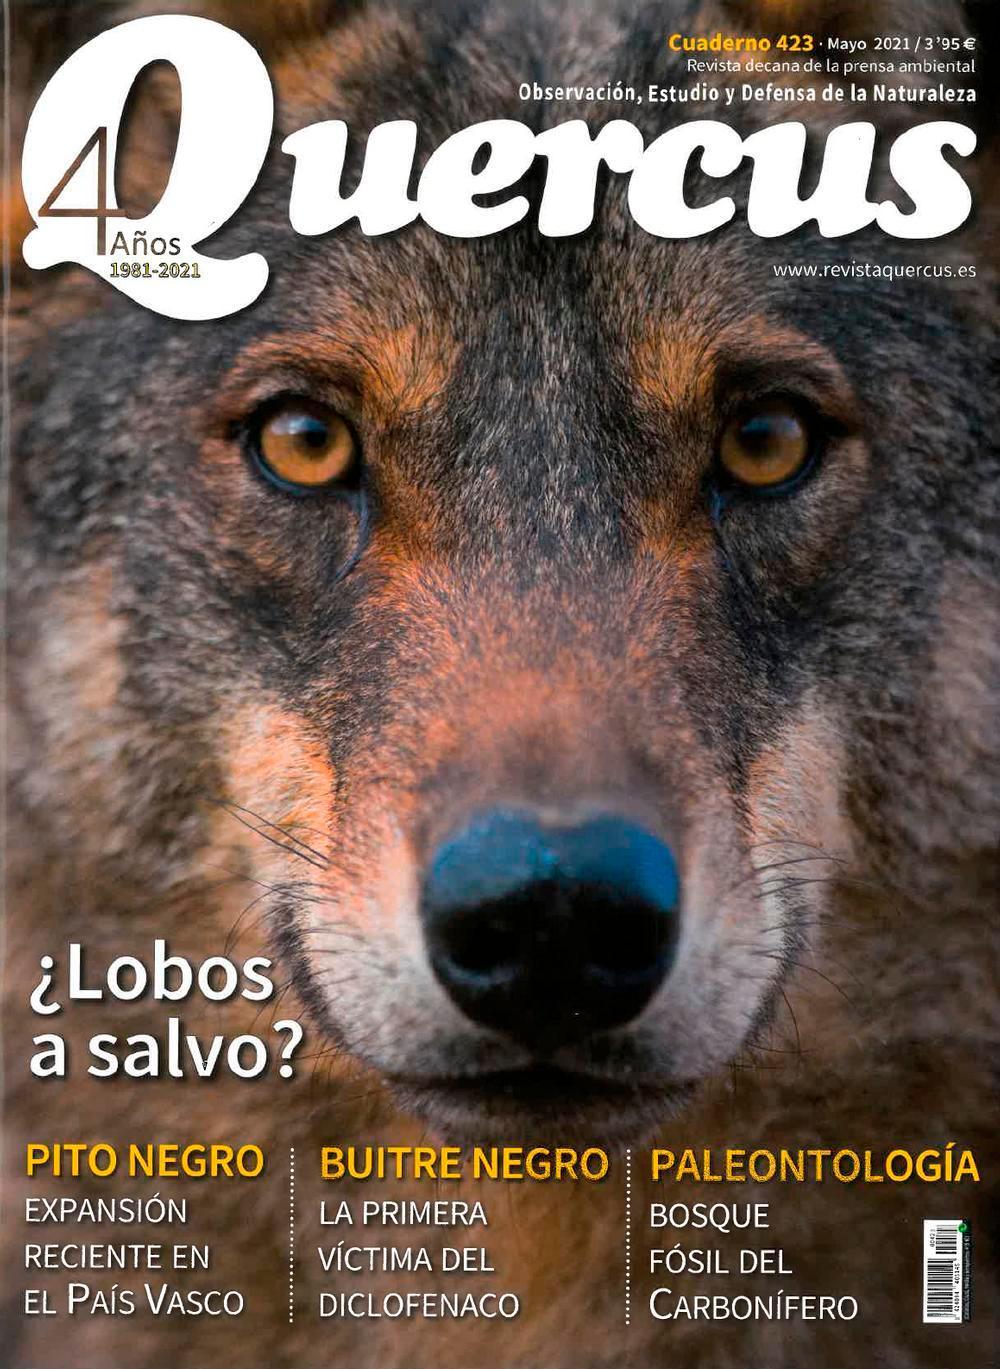 Portada de la revista Quercus de Mayo de 2021